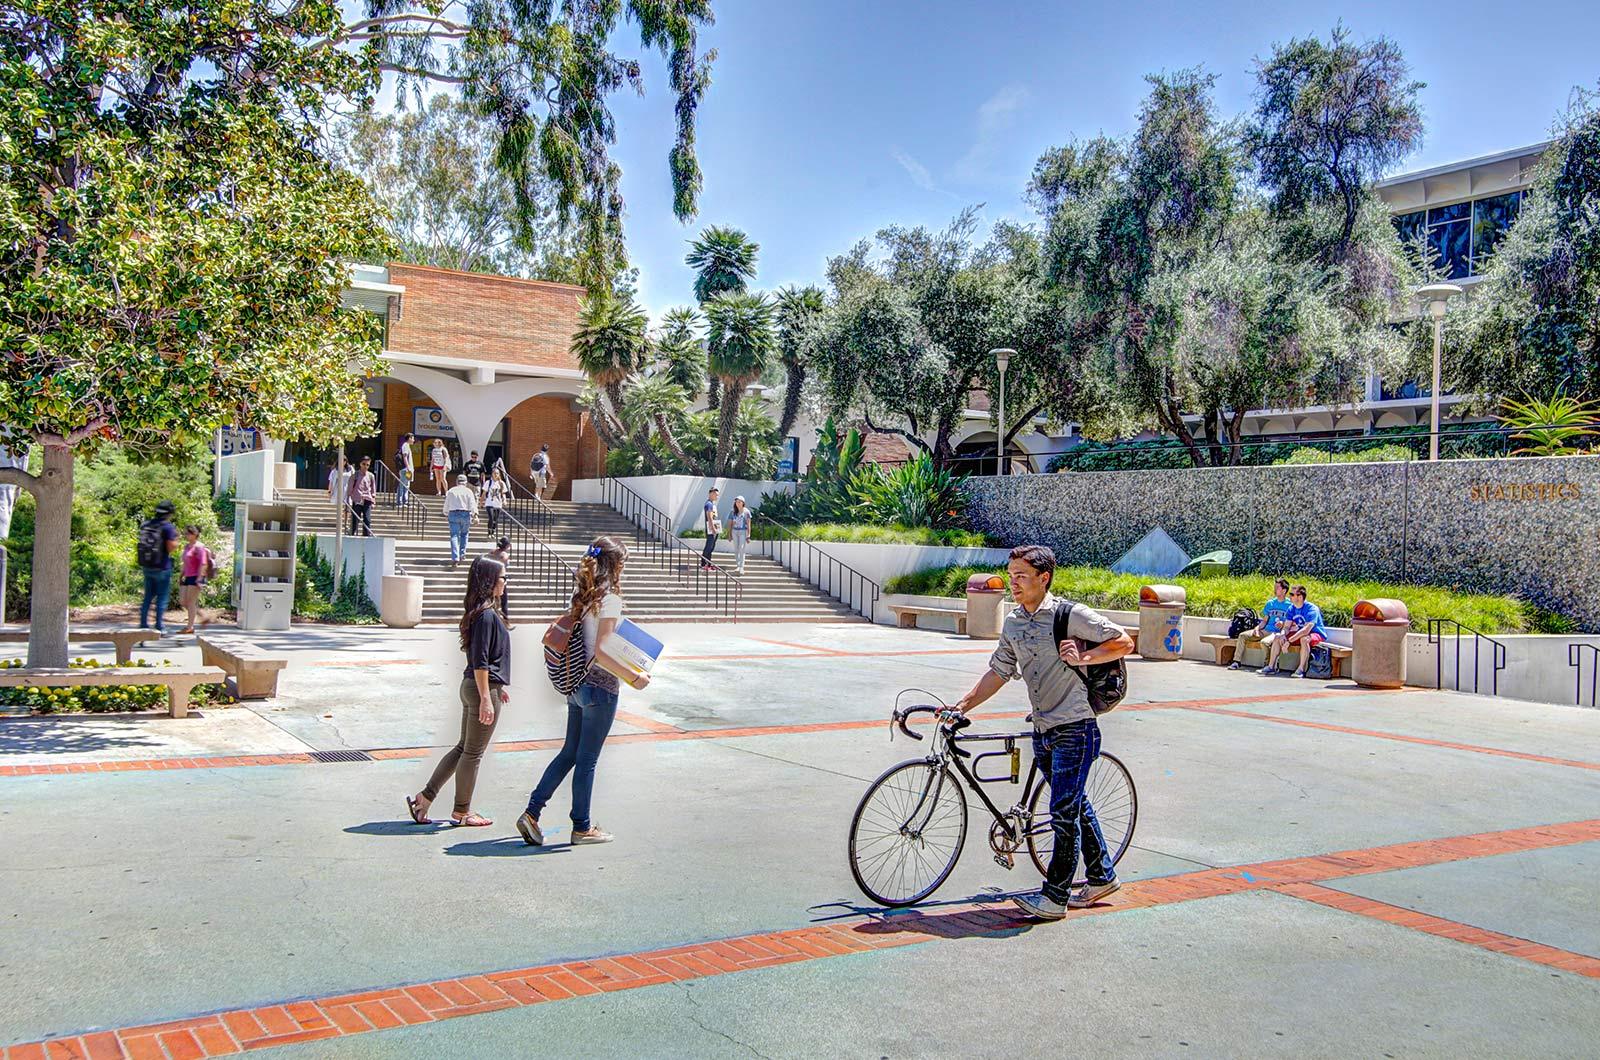 Courtyard-at-University-360-Tours-Virtual-Tour-Company-College-Vitual-Tours-Virtual-Tours-For-College